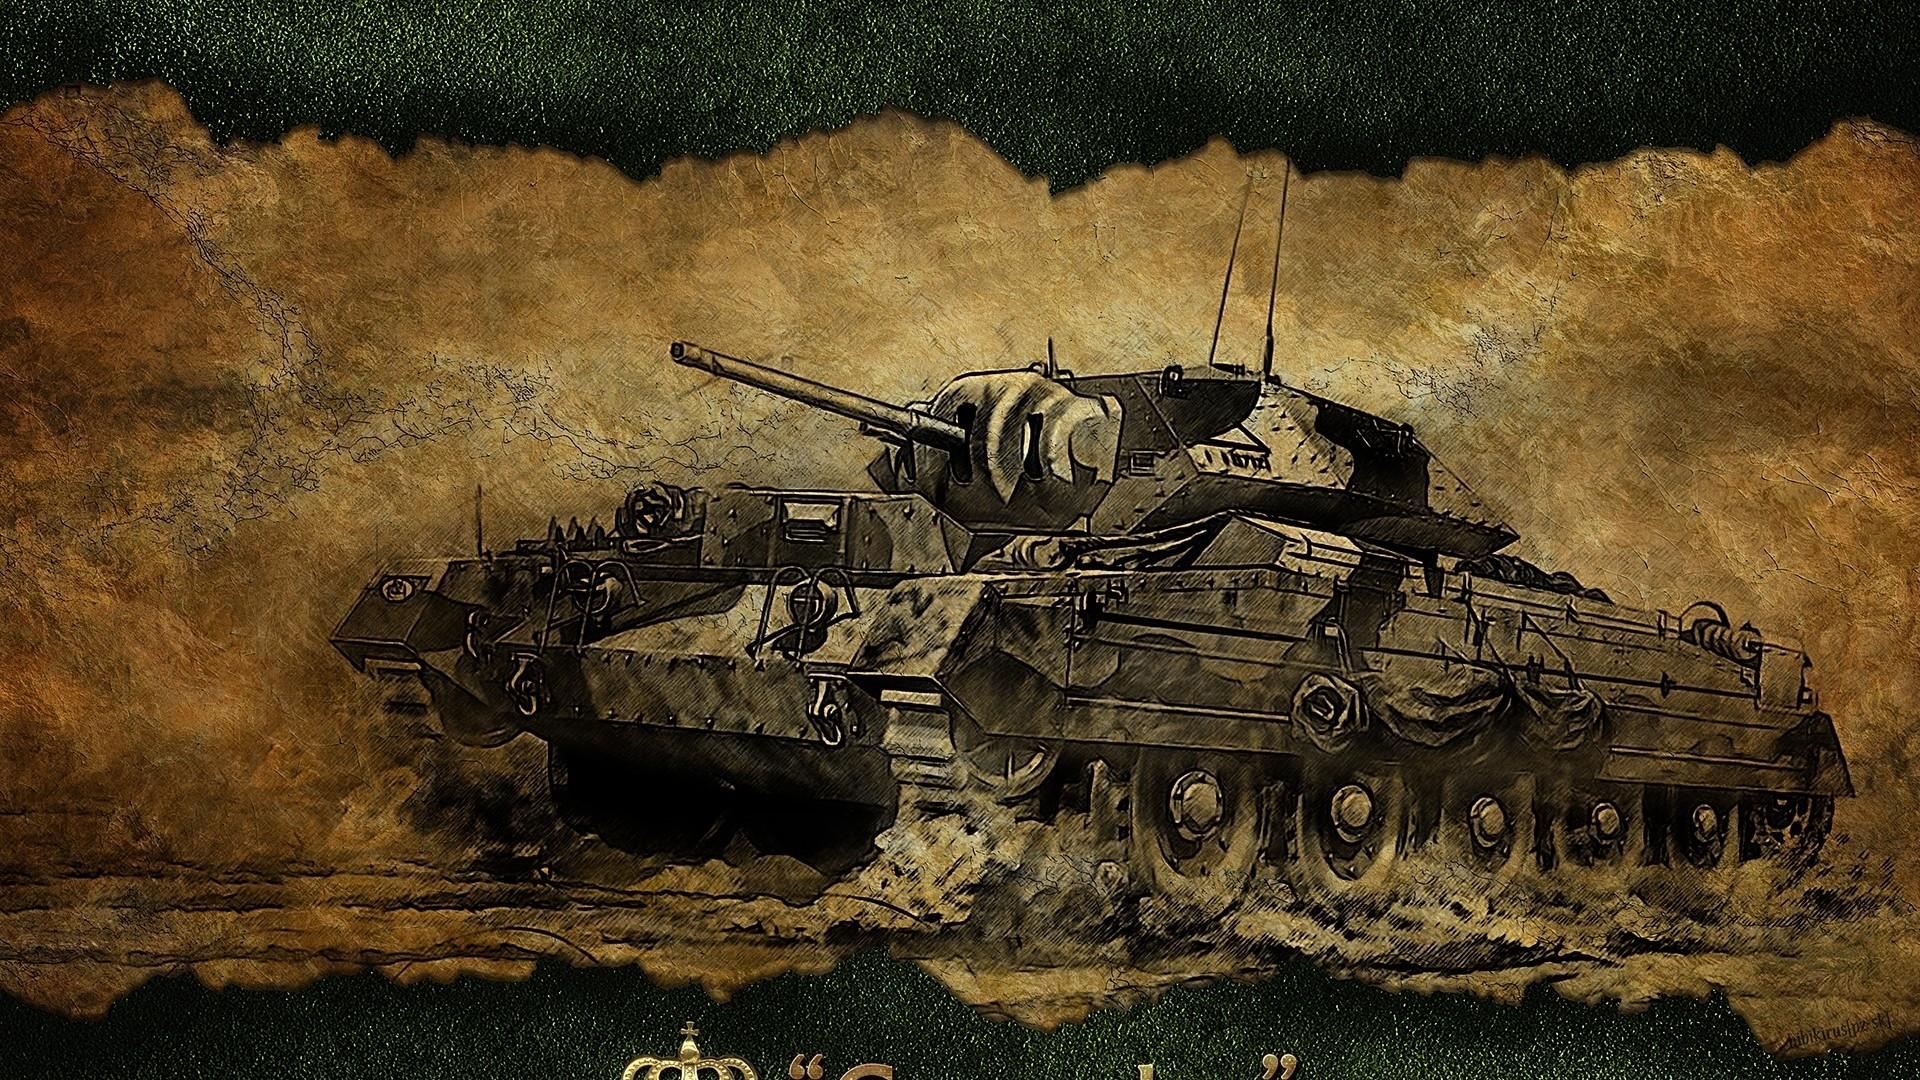 Preview wallpaper world of tanks, crusader, tank, game, figure 1920×1080